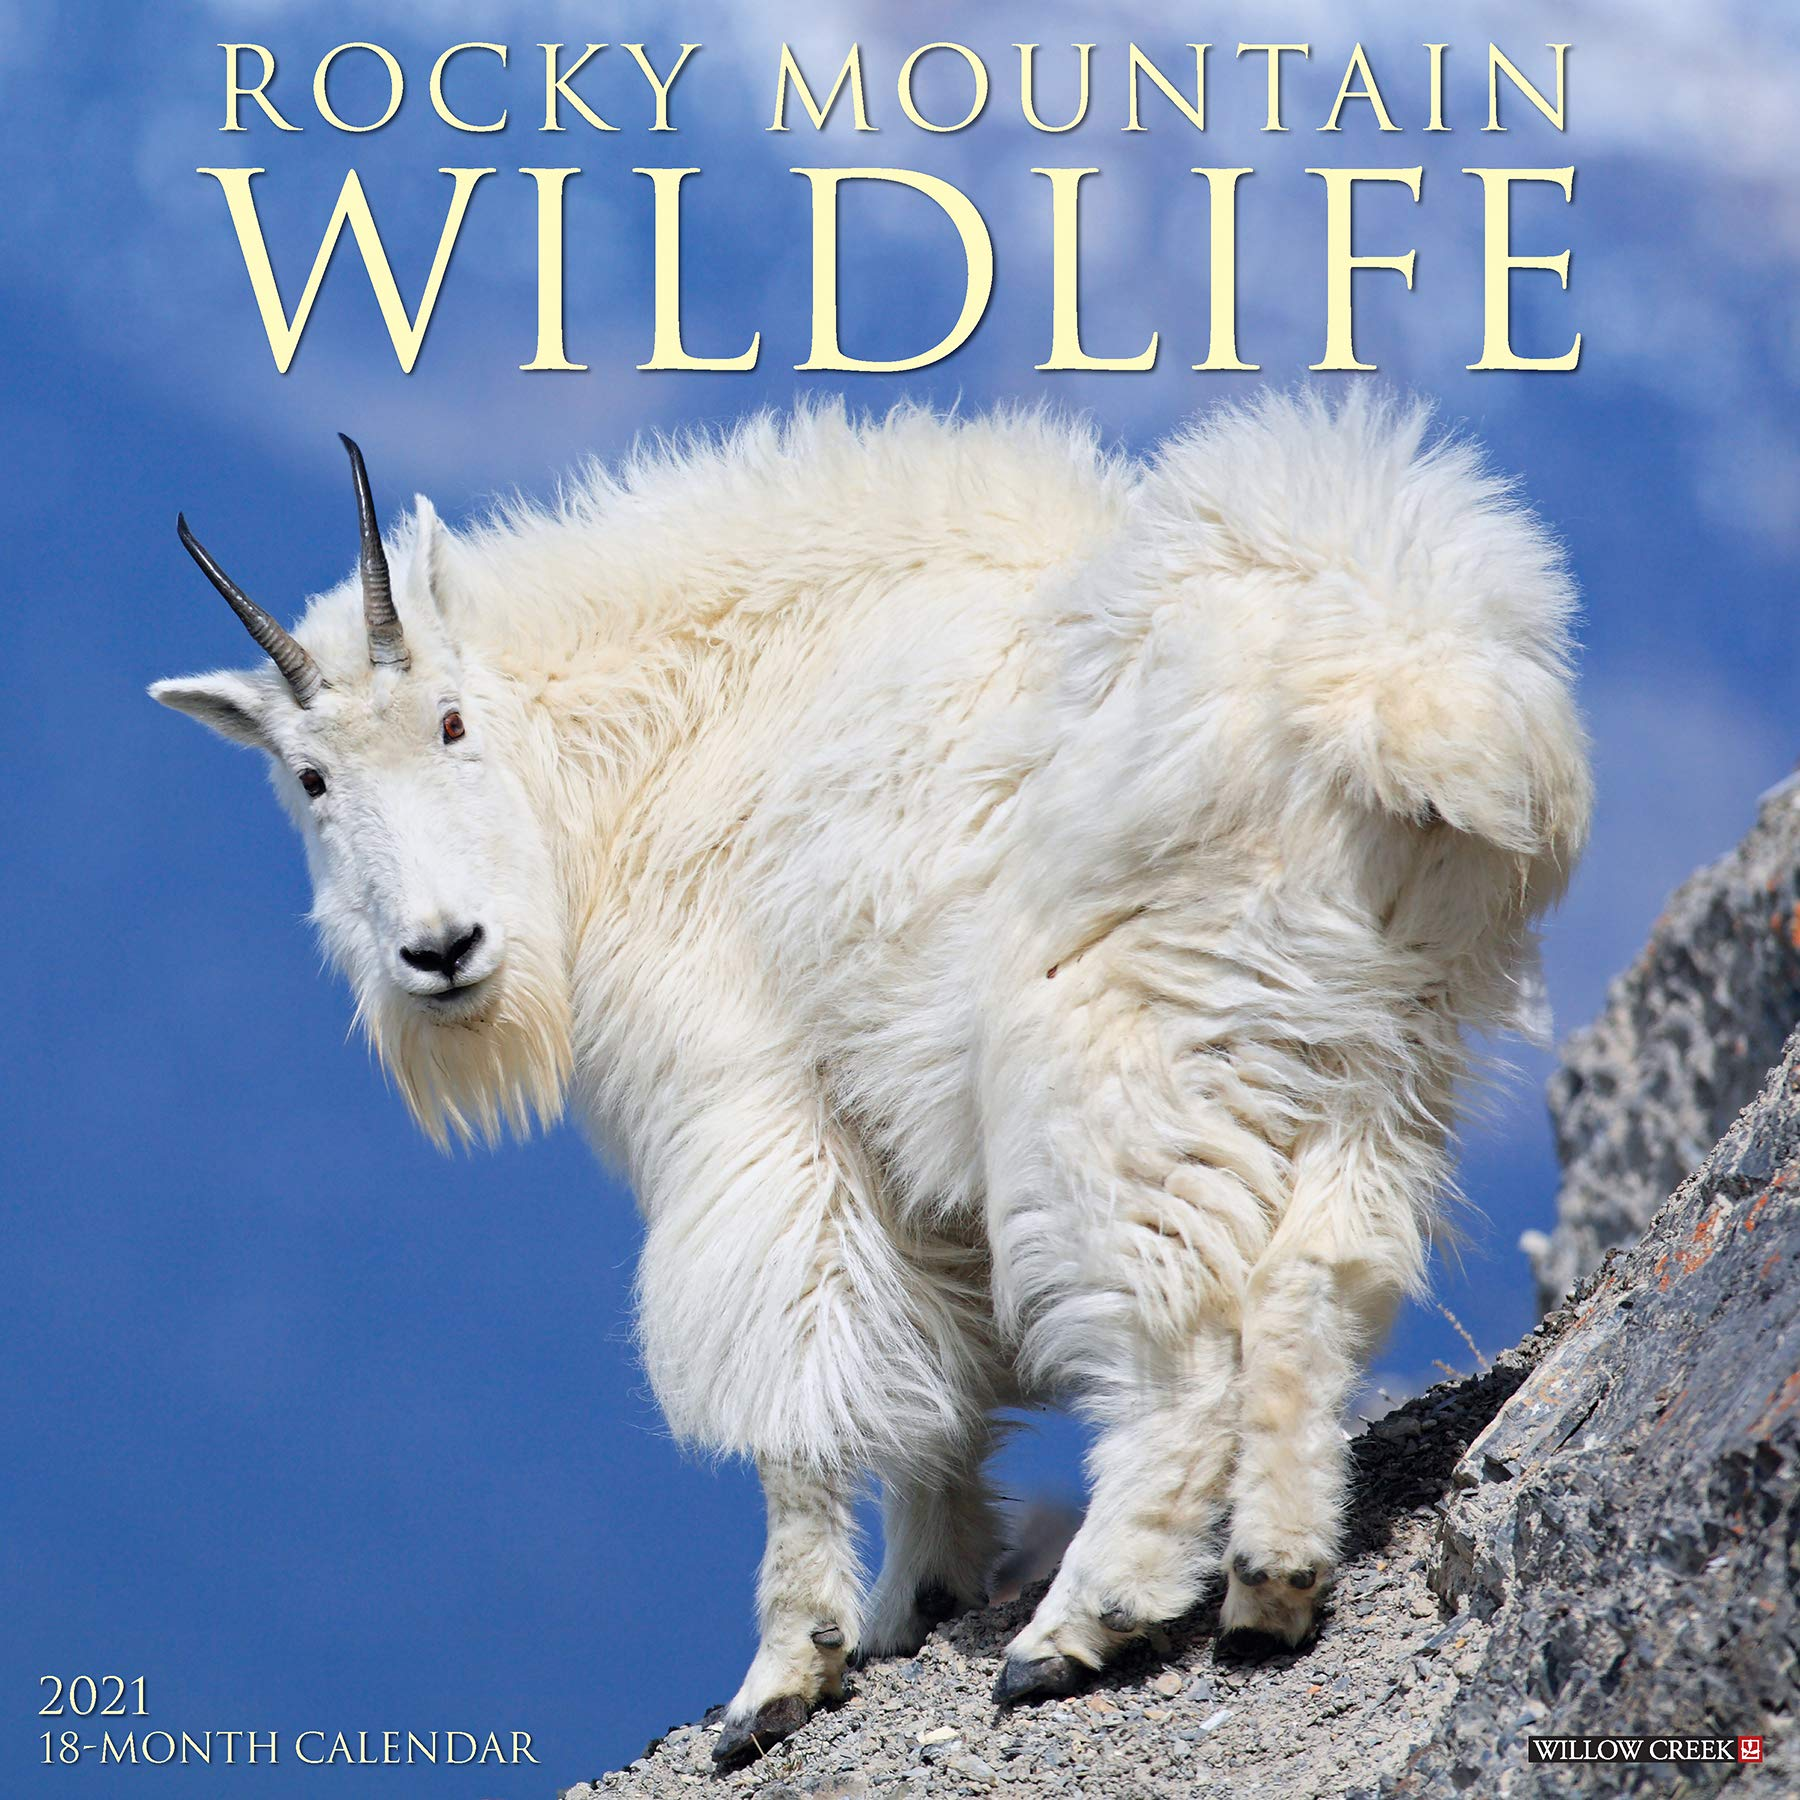 Sfsu 2021 Calendar Rocky Mountain Wildlife 2021 Wall Calendar: Willow Creek Press